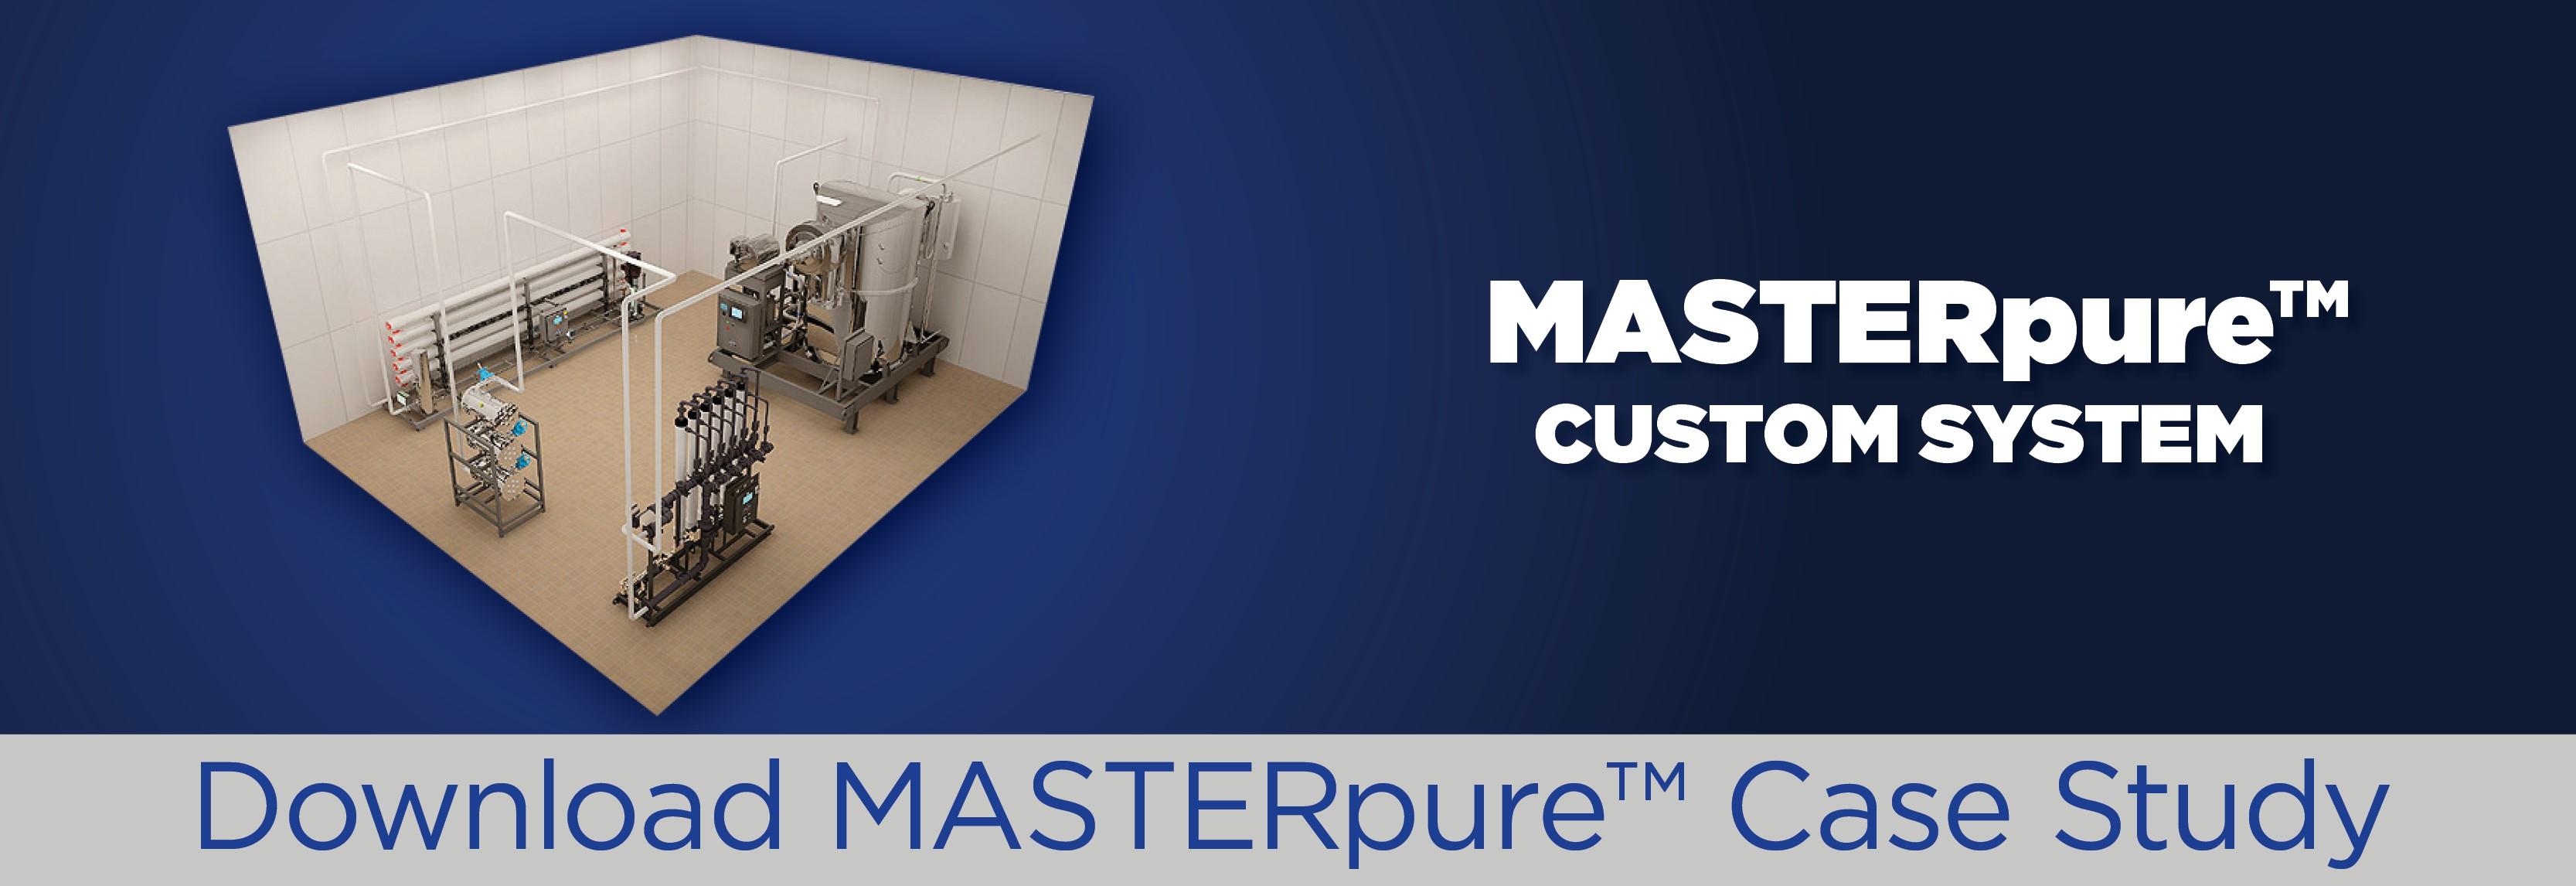 Lander Banner_MASTERpure_Case Study.jpg